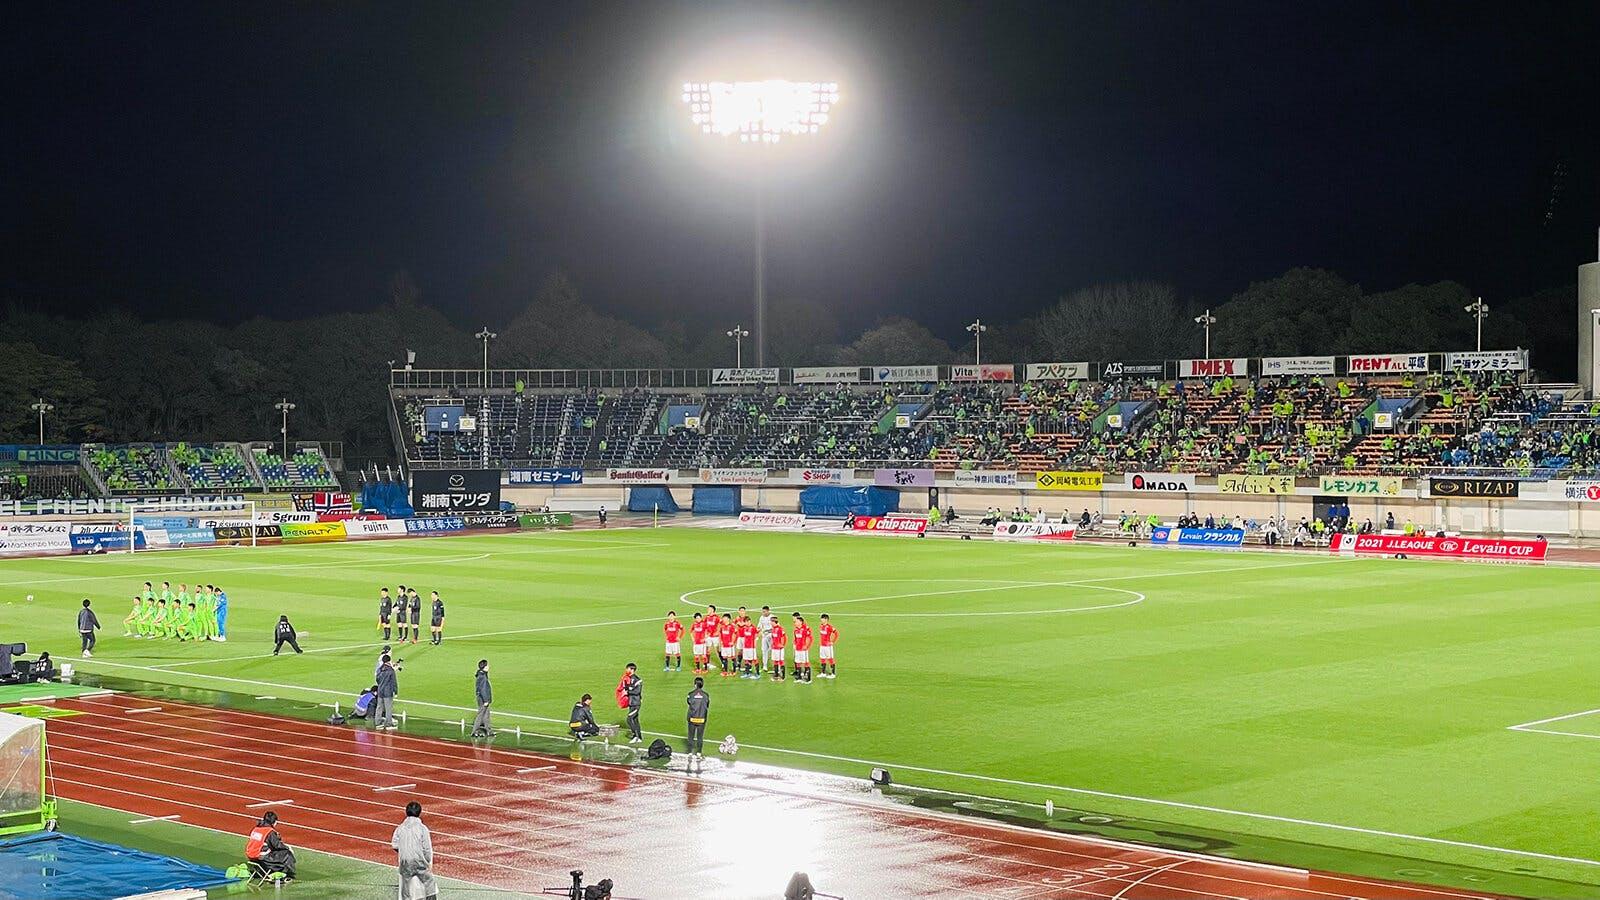 2021 Jリーグ YBC ルヴァンカップ グループステージ 第1節 レモンガススタジアム平塚 アウェー 湘南ベルマーレ戦